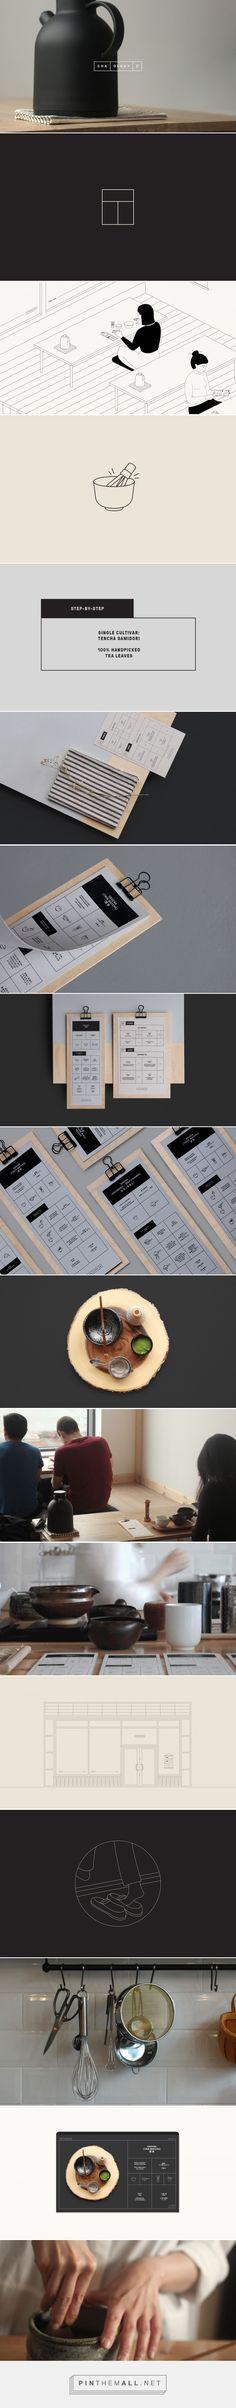 Cha.ology / Branding / Ideas / Inspiration / Brand design / Brand Identity / Logo design / Minimalist / Minilam / Restaurant / Tea / Tatami / Conceptual / Asian / Japanese / Cultural / Modern / Elegant / Clean / Geometric / Simple / Clean / White Space / Japan / Drink / Matcha /